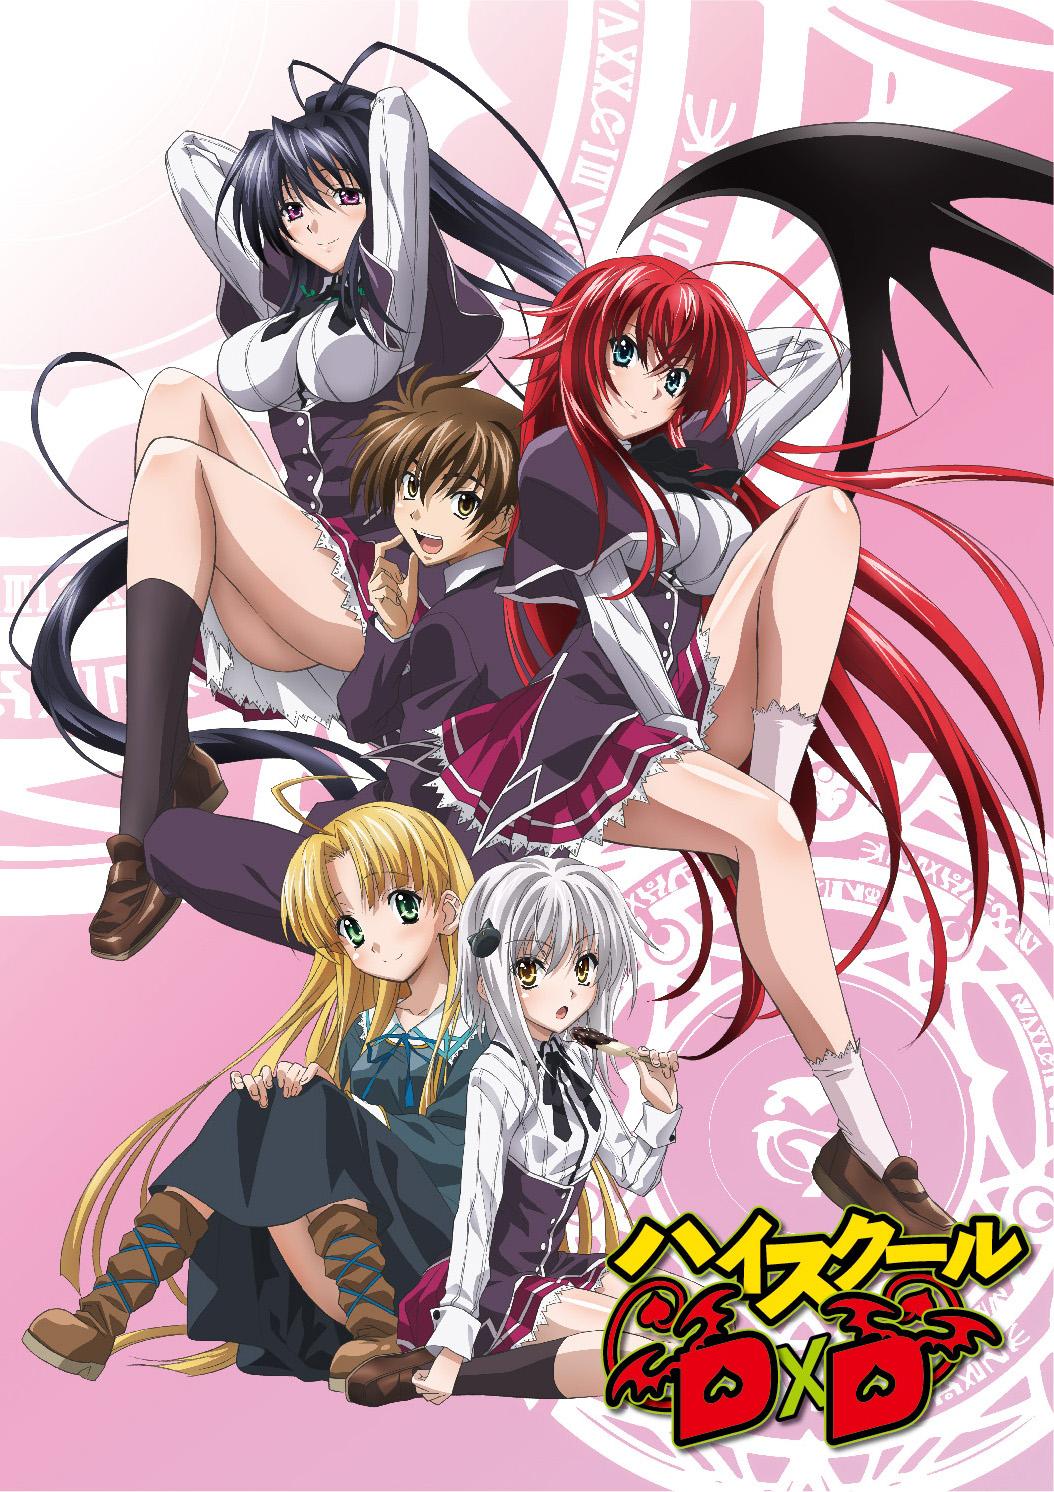 hing school dxd1_High School DxD (anime) | High School DxD Wiki | FANDOM powered by Wikia